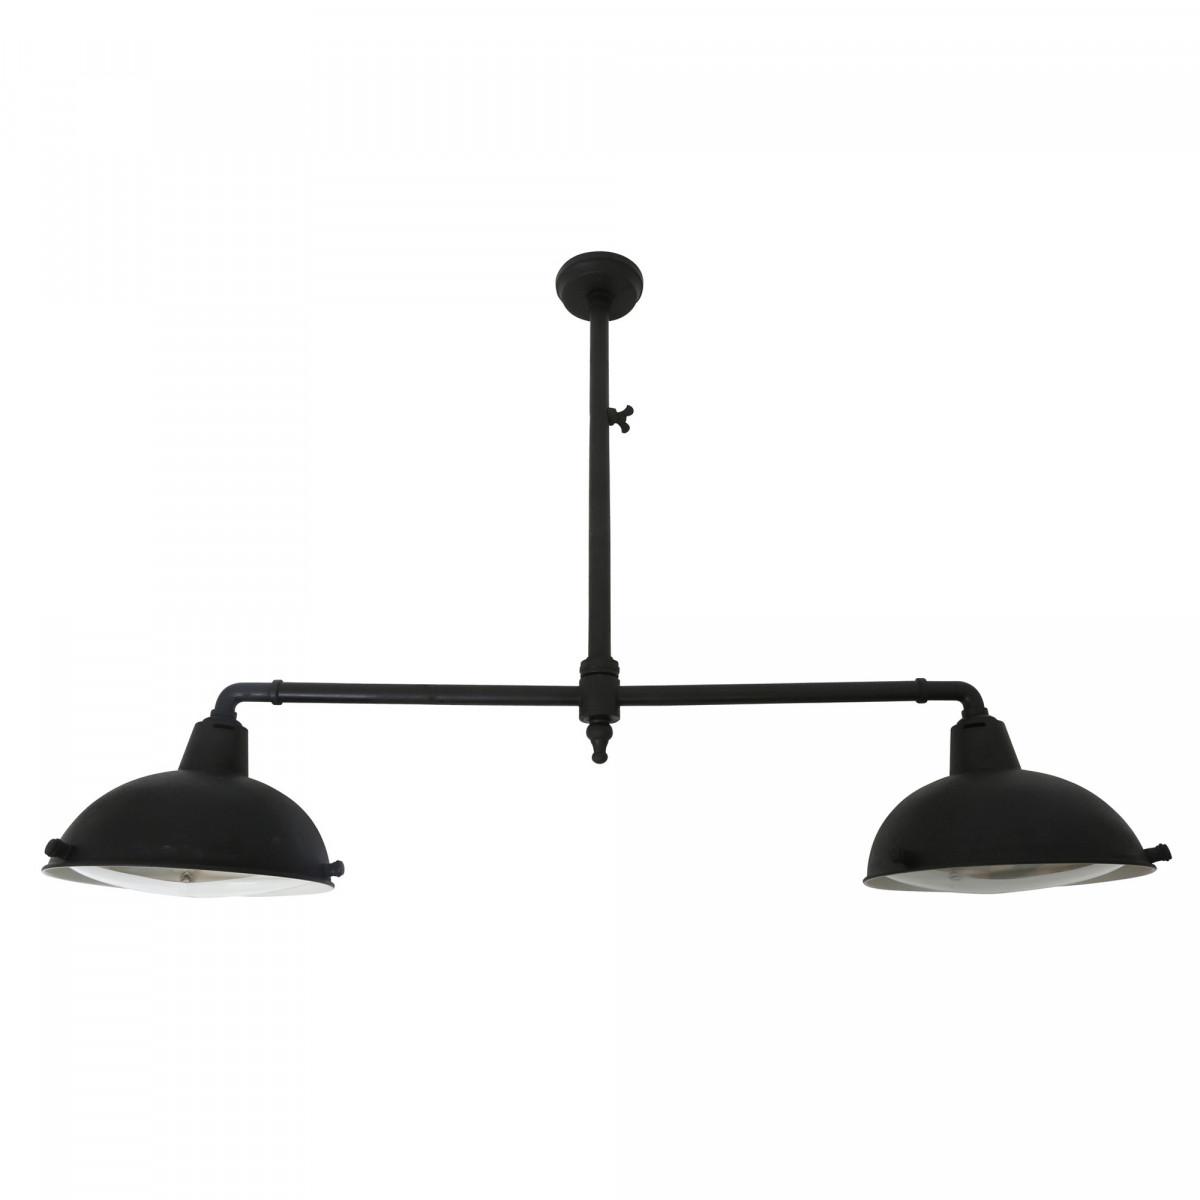 Hanglamp Billiards 2 black